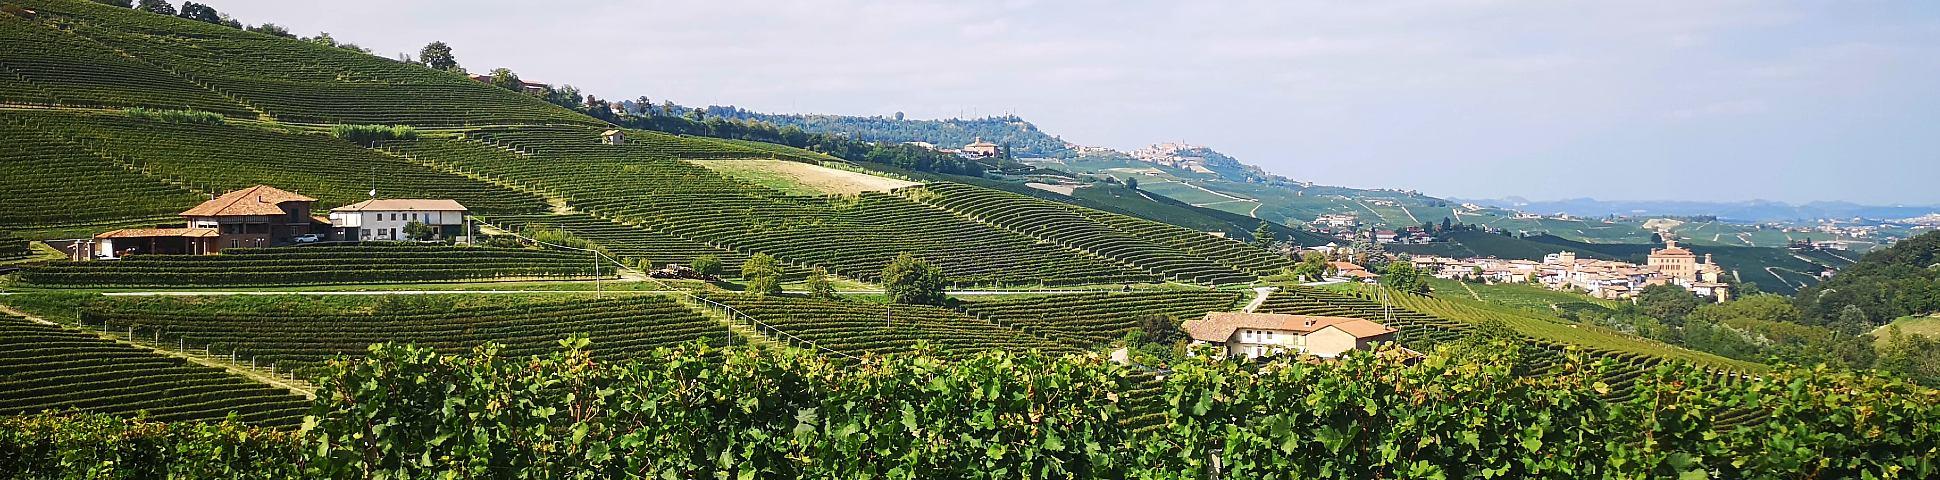 Piedmont in Italy